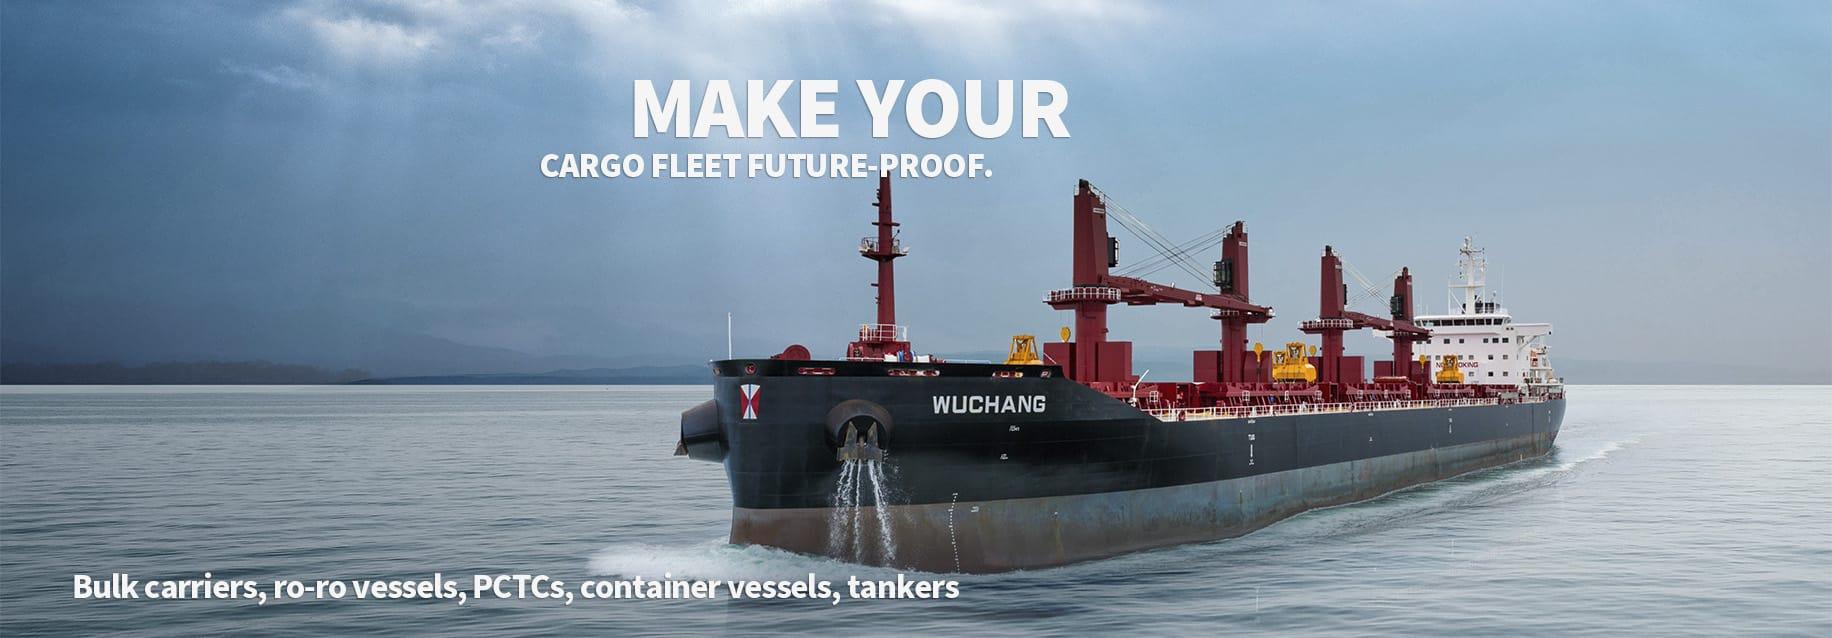 Make your cargo fleet future proof